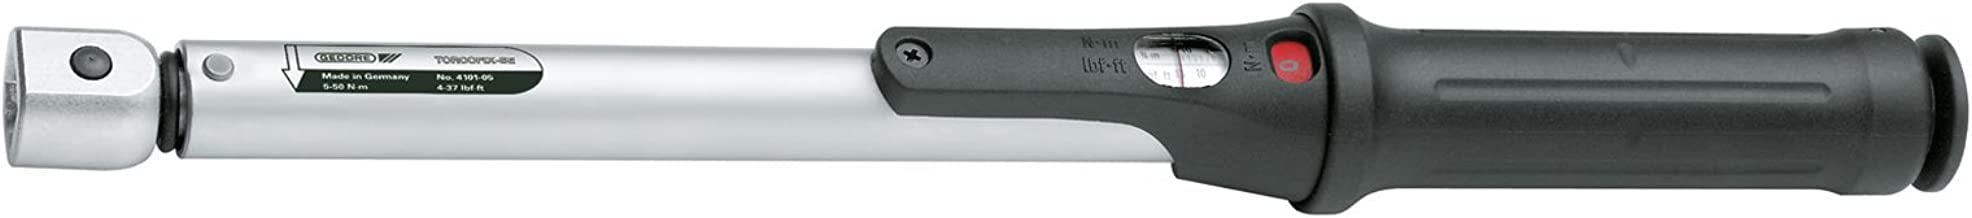 14 mm Gedore 0007657320014 Llave combinada